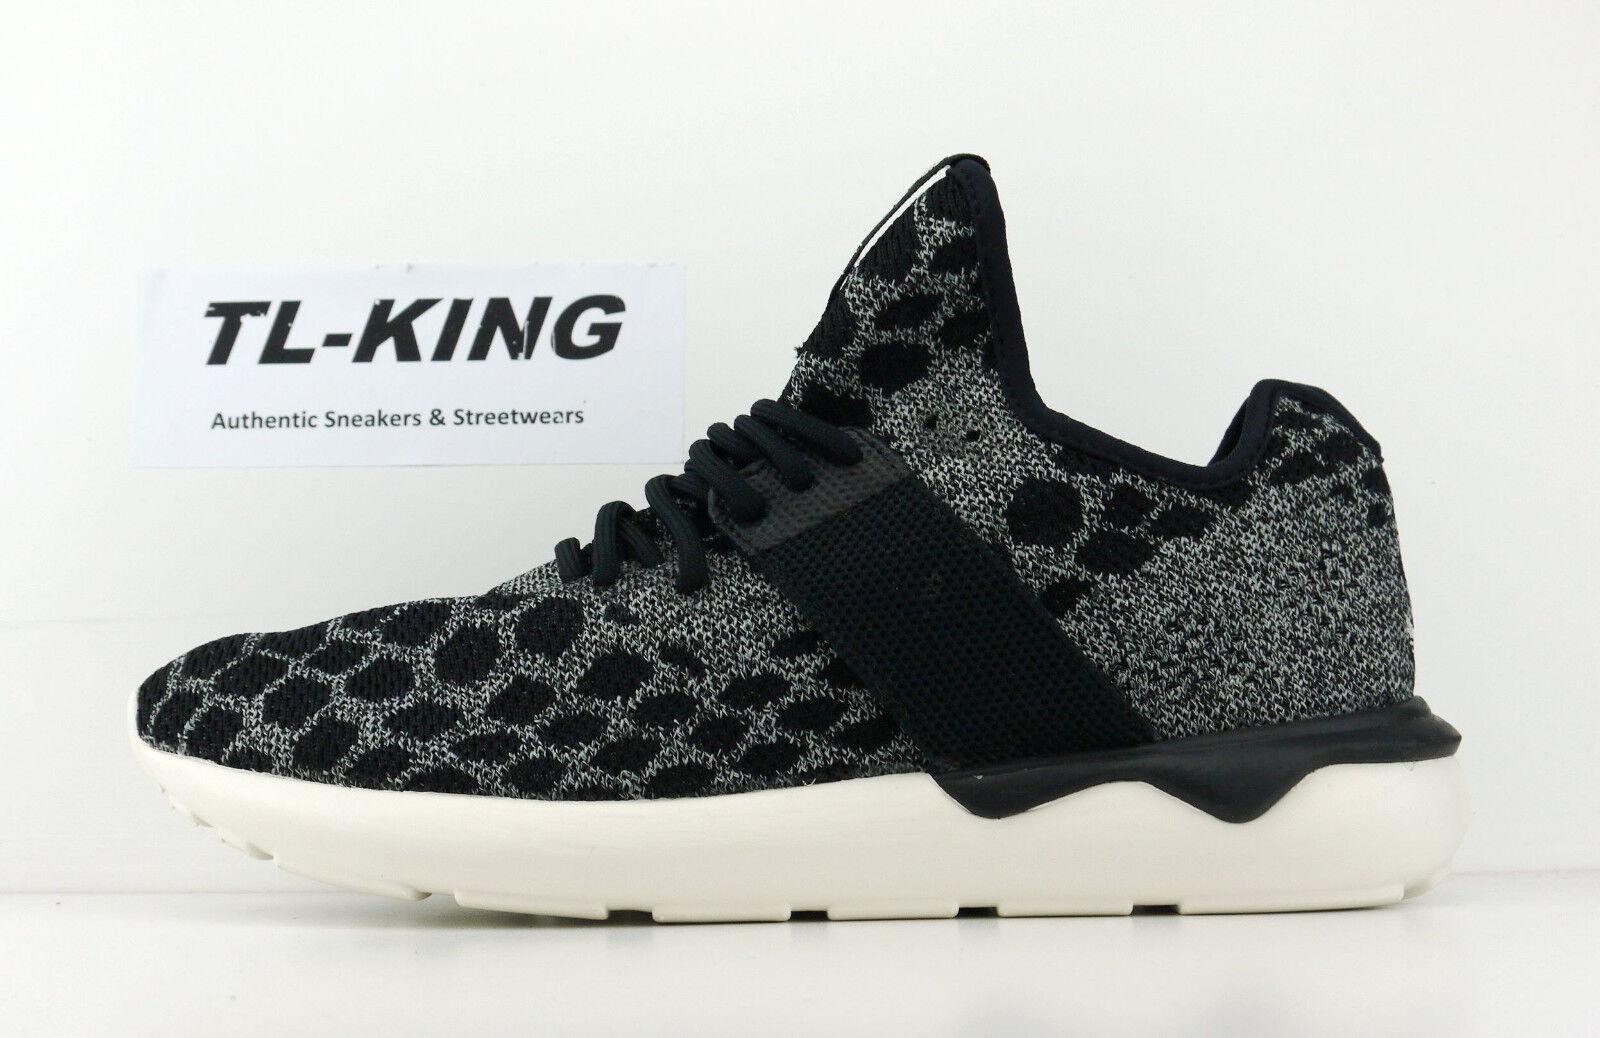 Adidas Originals Tubular Runner Rrimeknit PK Blk Carbon Snake Pattern B25573 Gi Brand discount